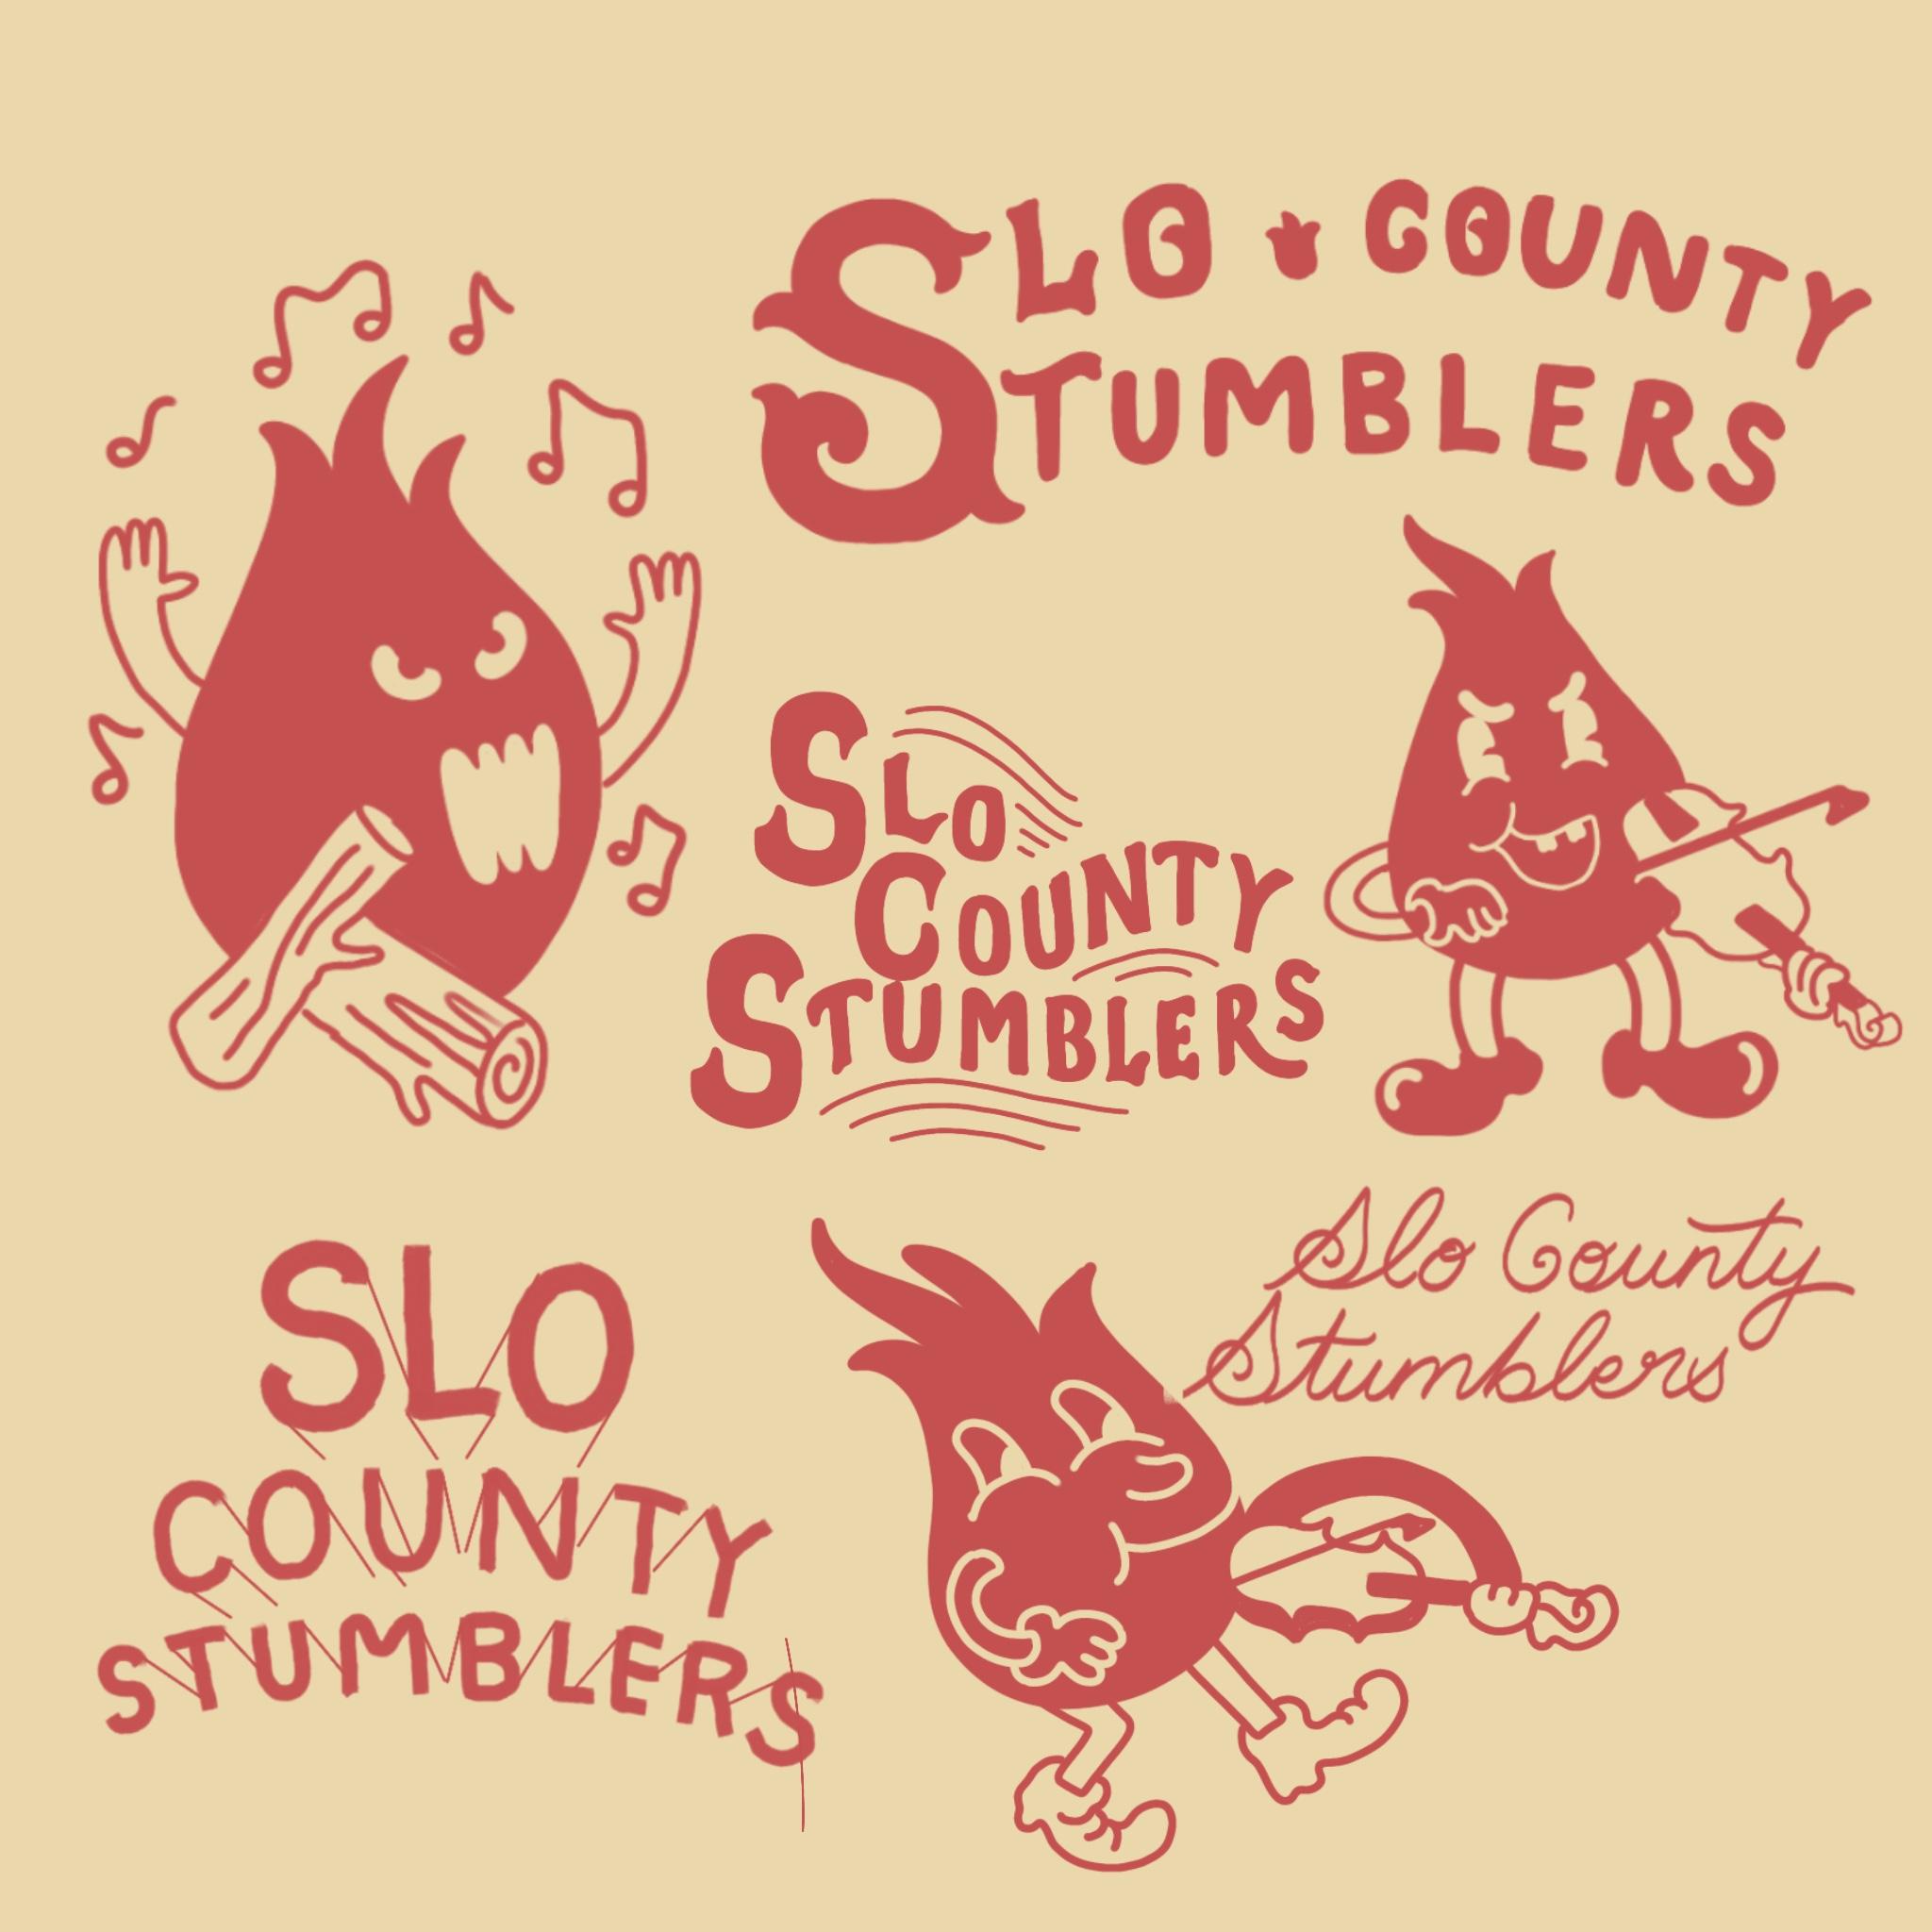 SLO COUNTY STUMBLERS